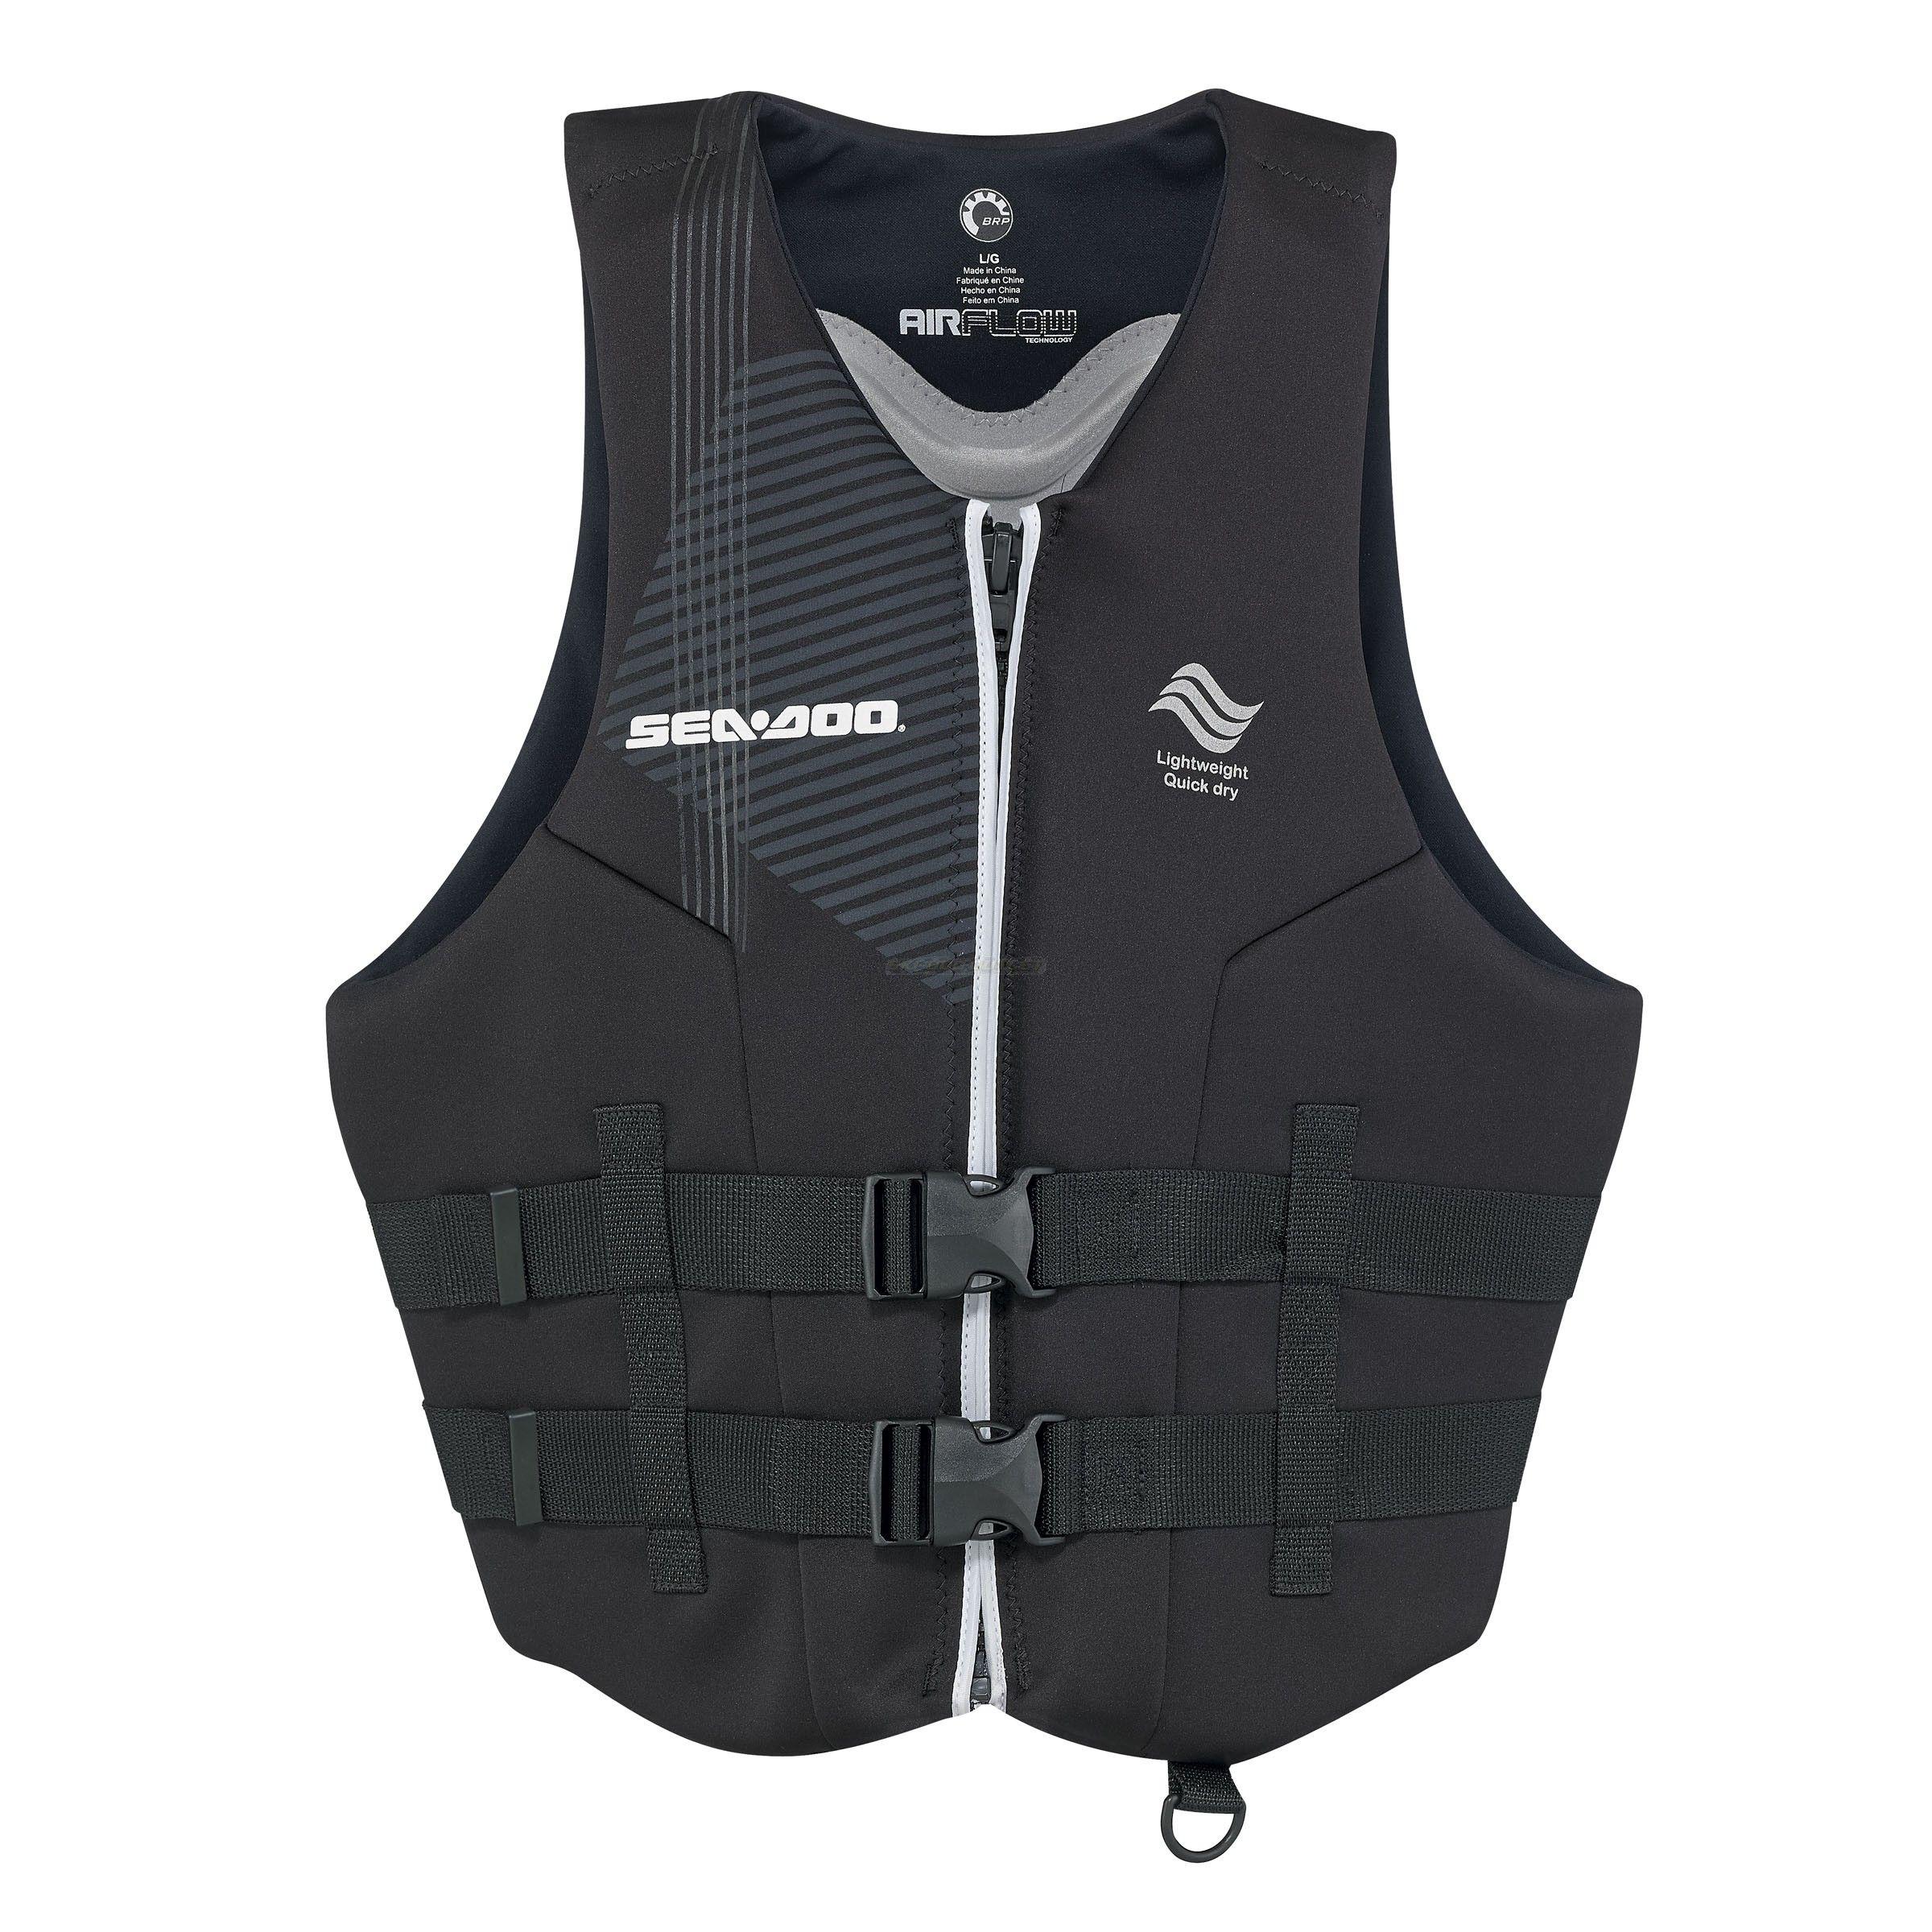 Sea Doo Men S Ecoprene Airflow Pfd Life Jacket Vest Black Ski Doo Outlet Life Jacket Seadoo Life Vest